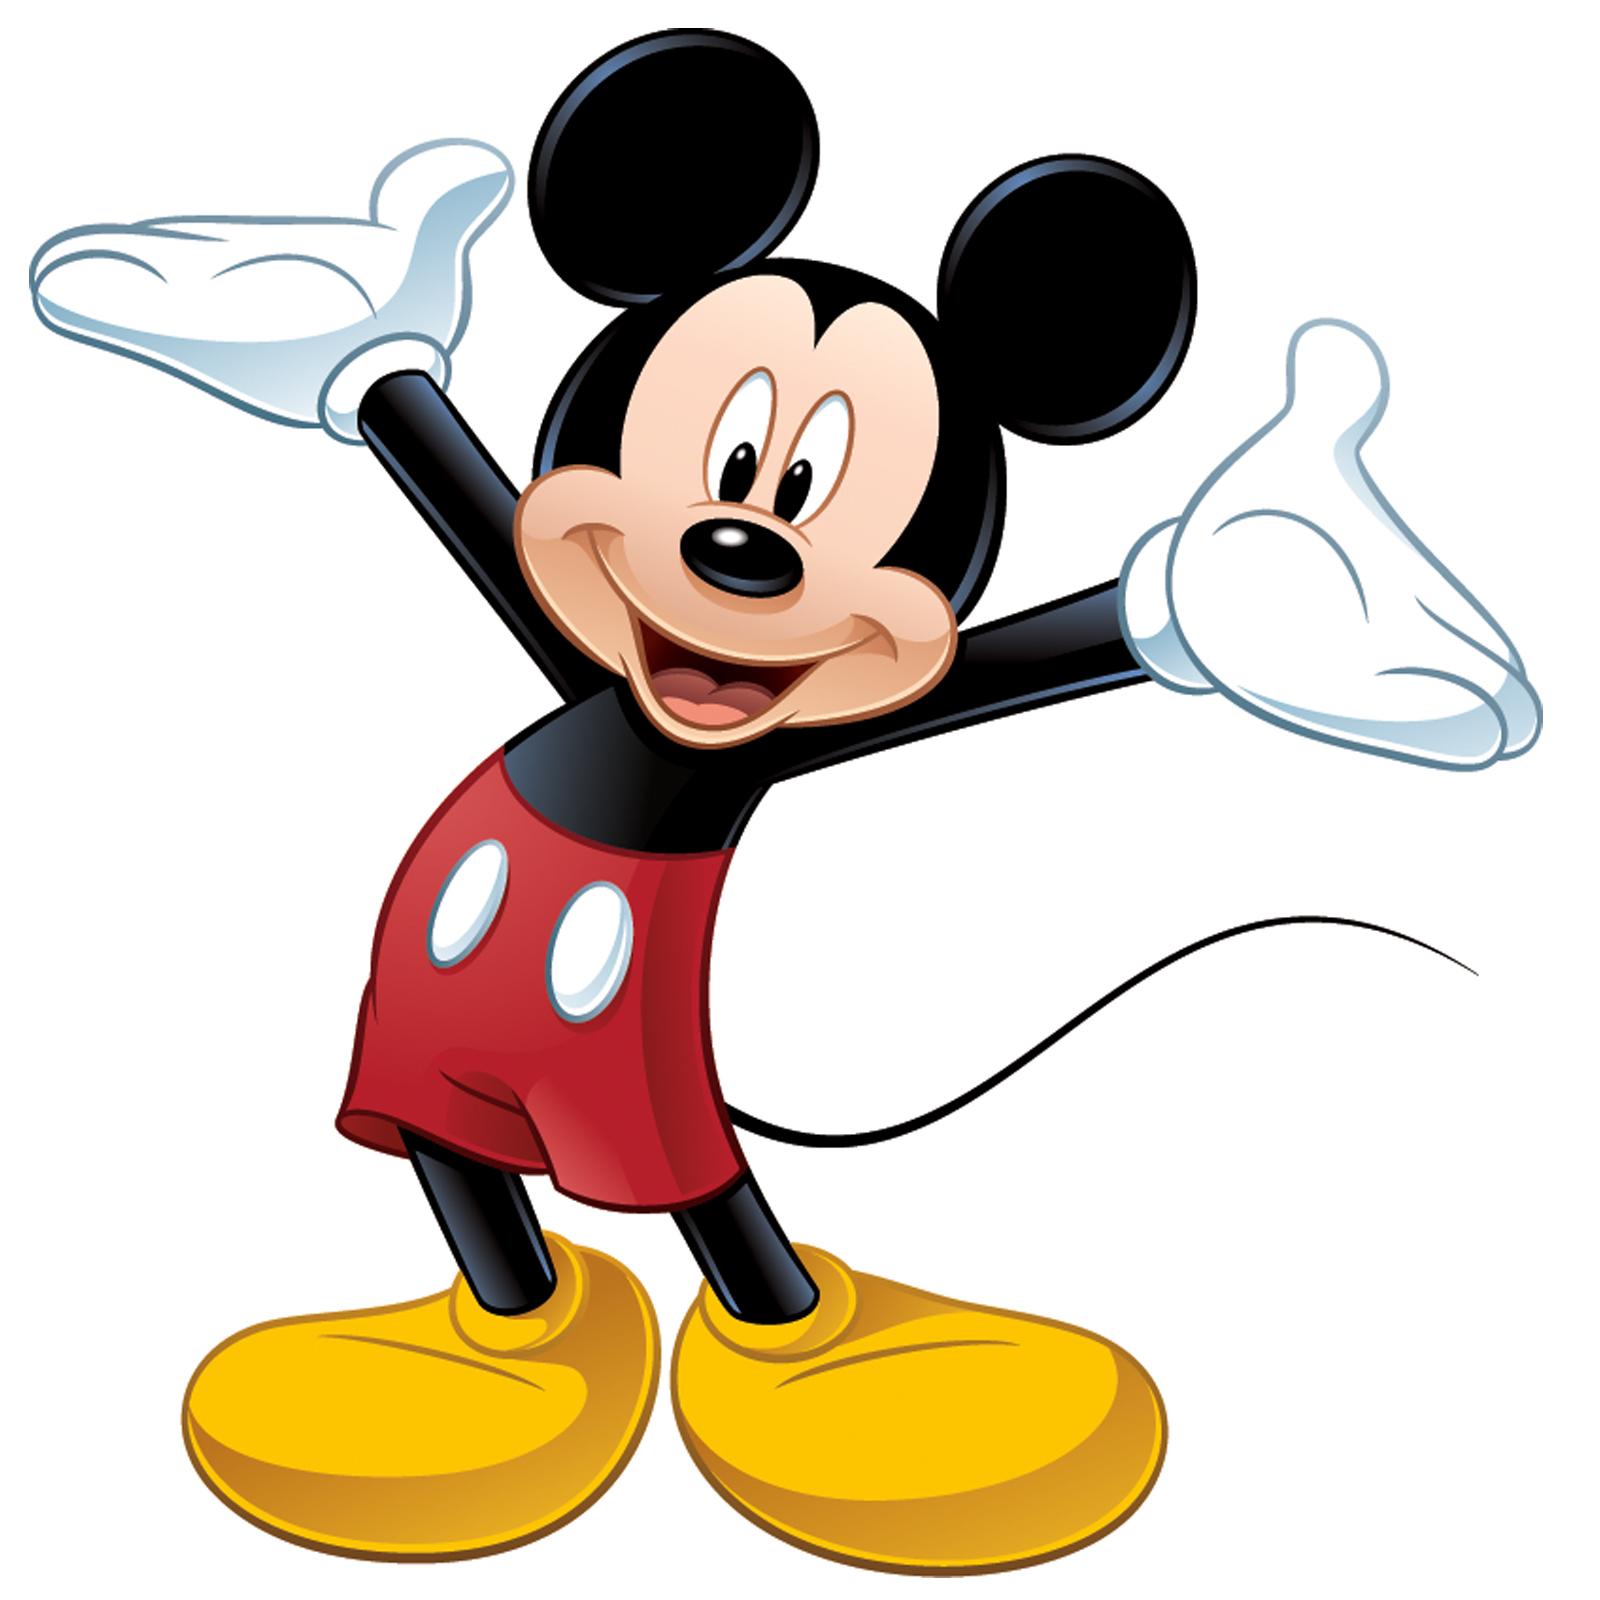 Dessins en couleurs imprimer mickey mouse num ro 259779 - Mickey mouse dessin ...